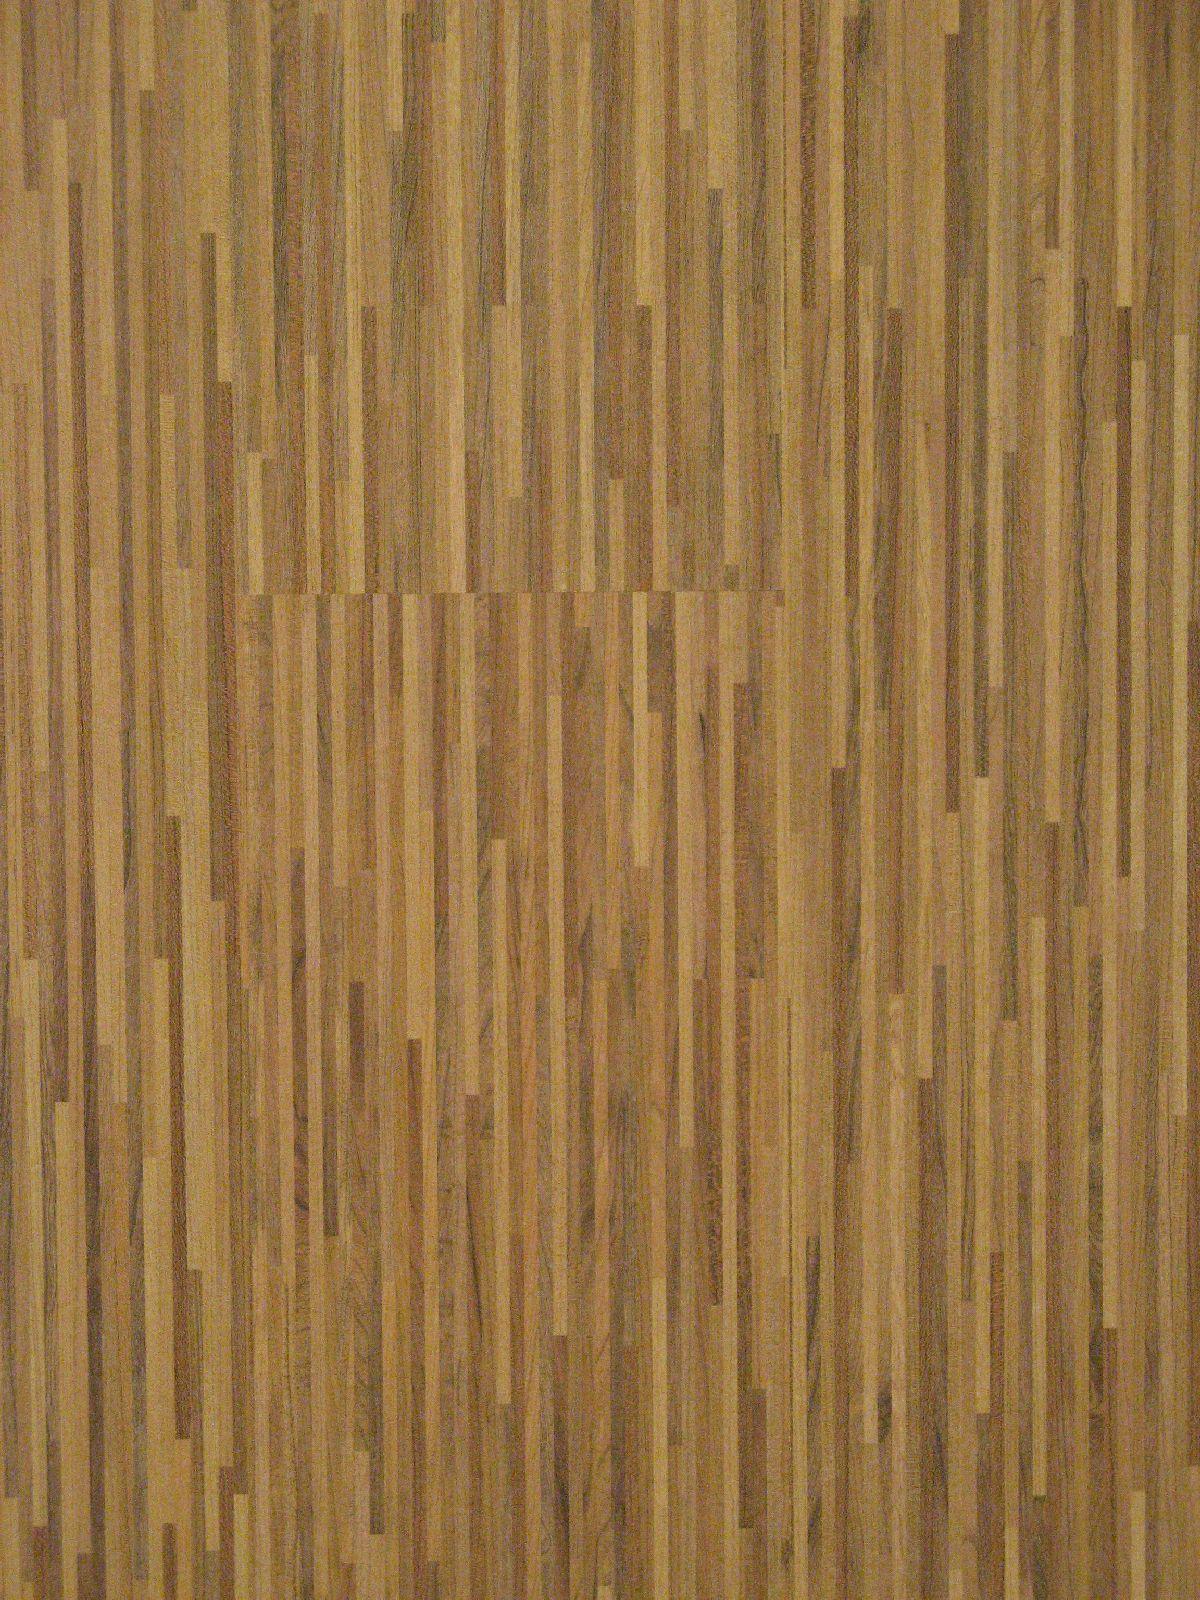 Wood_Textures_B_5028